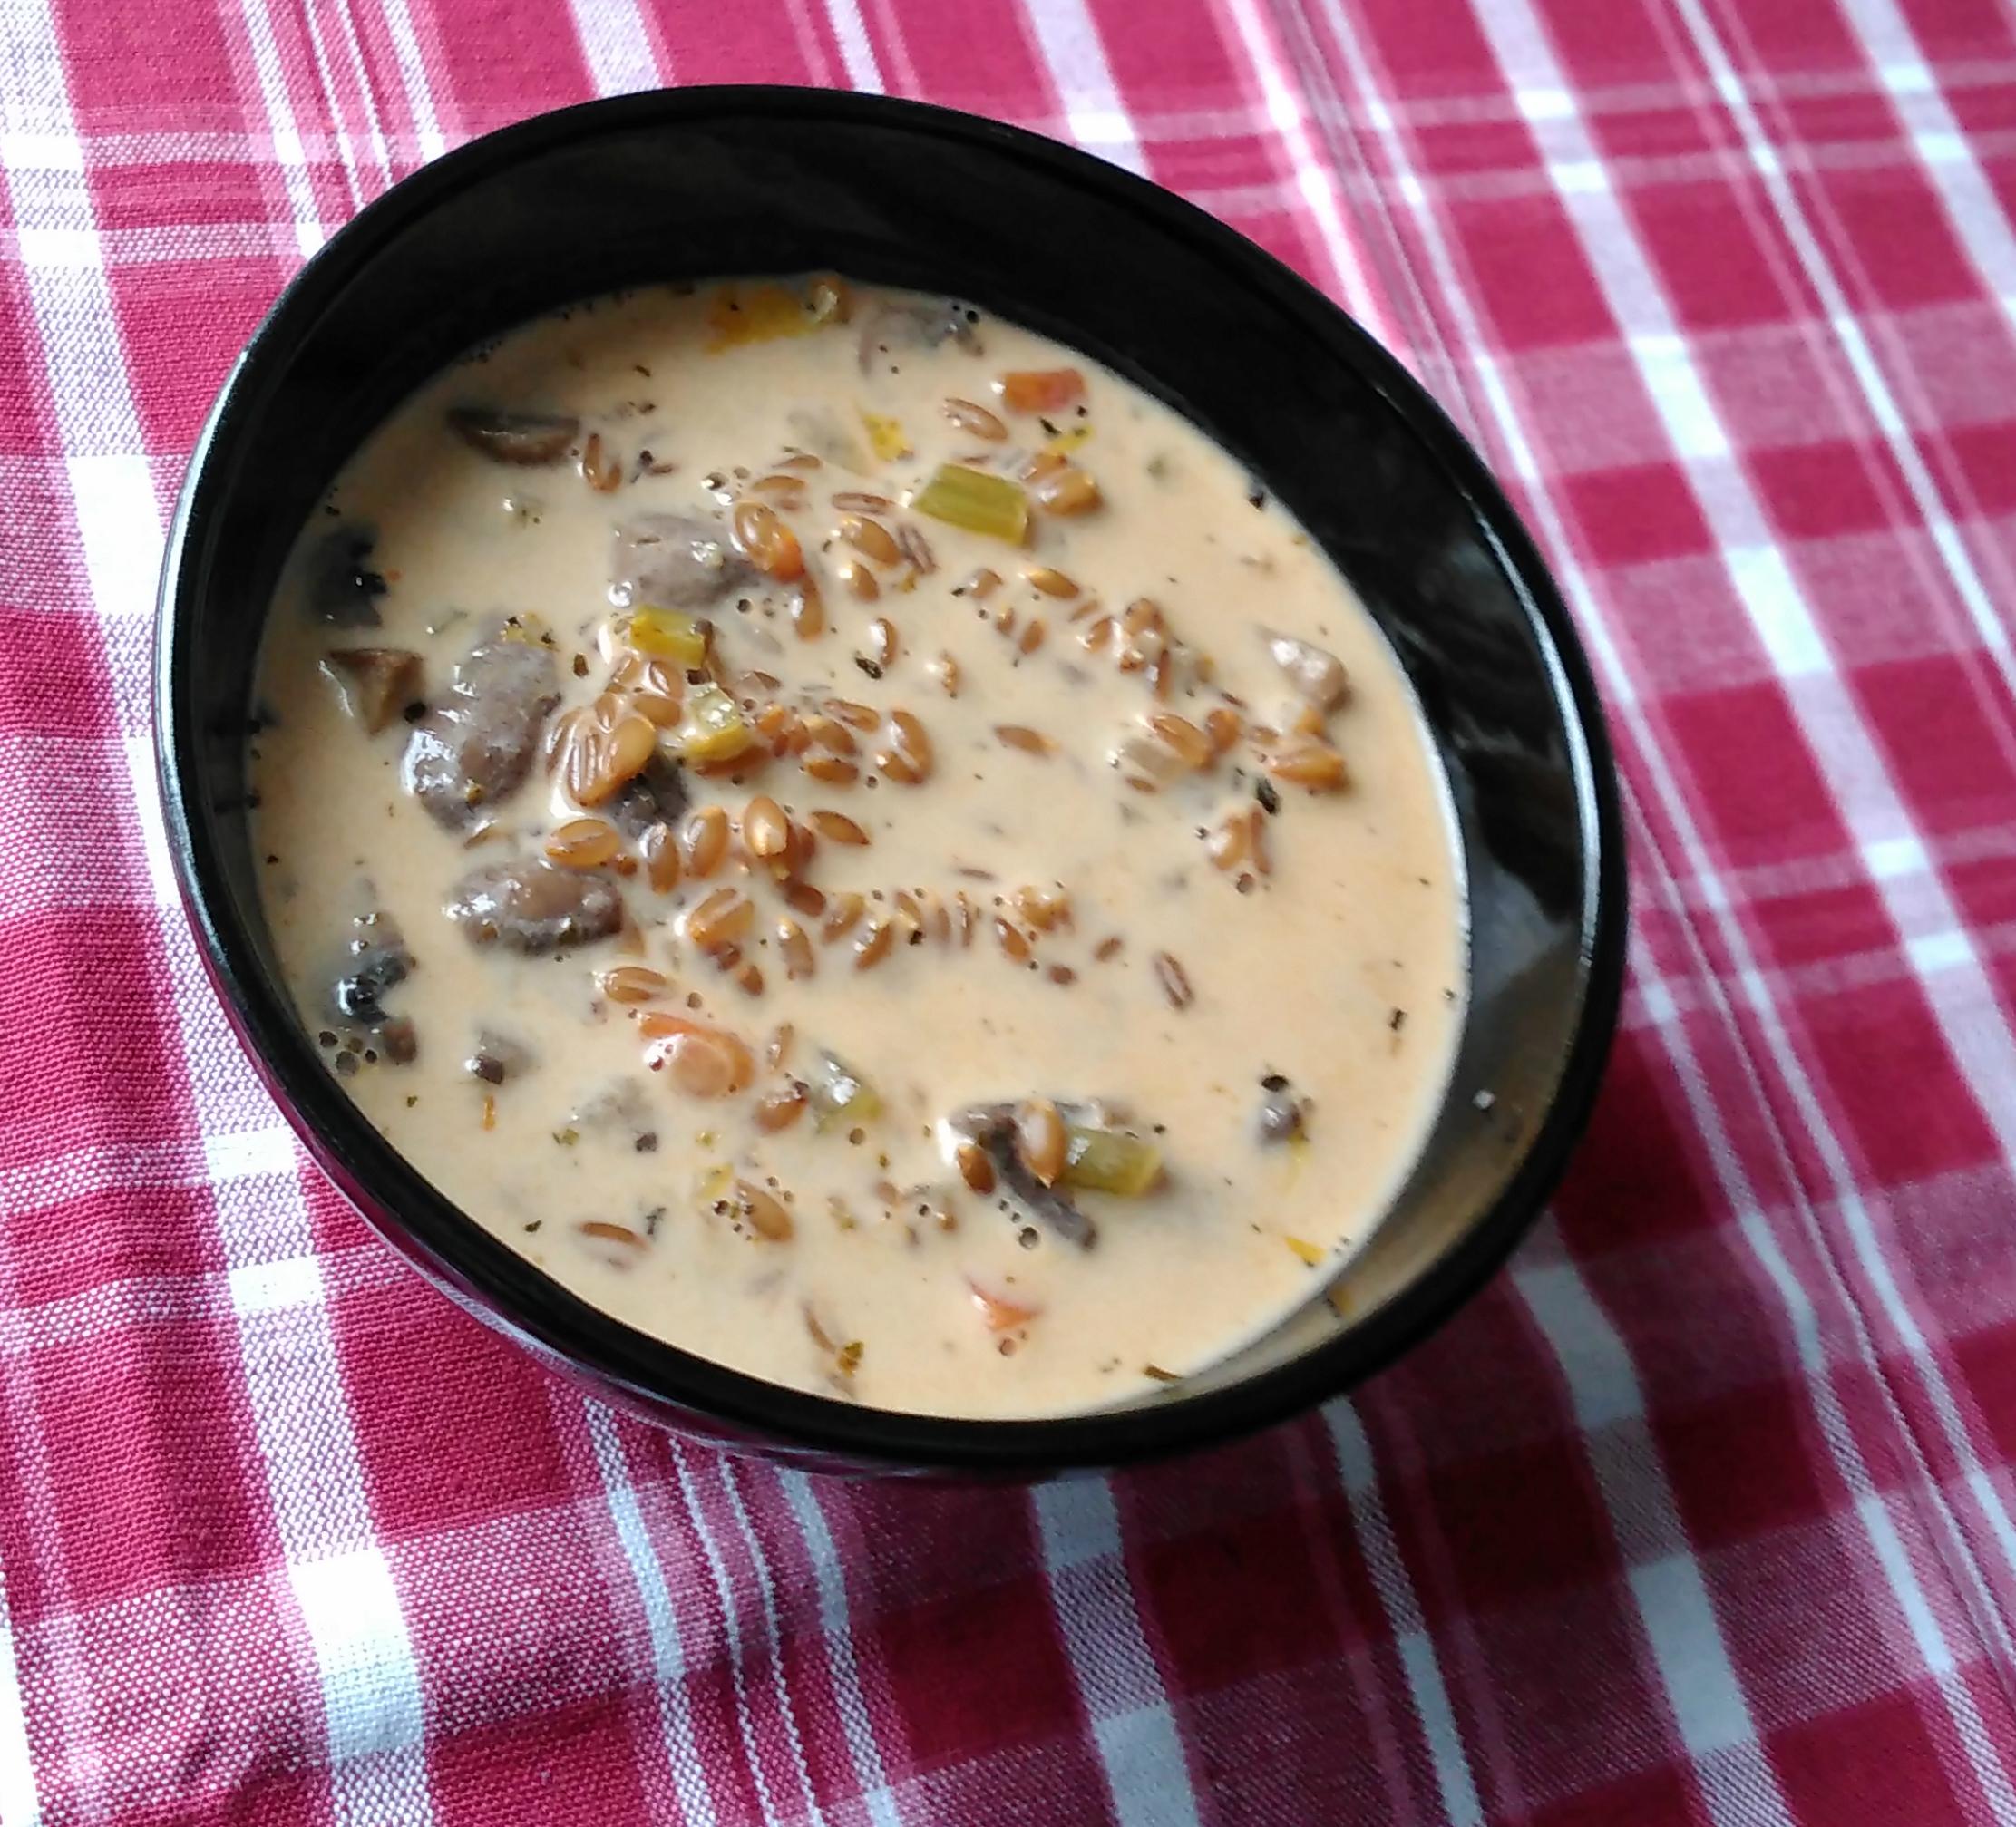 Vegan Creamy Mushroom and Farro Soup